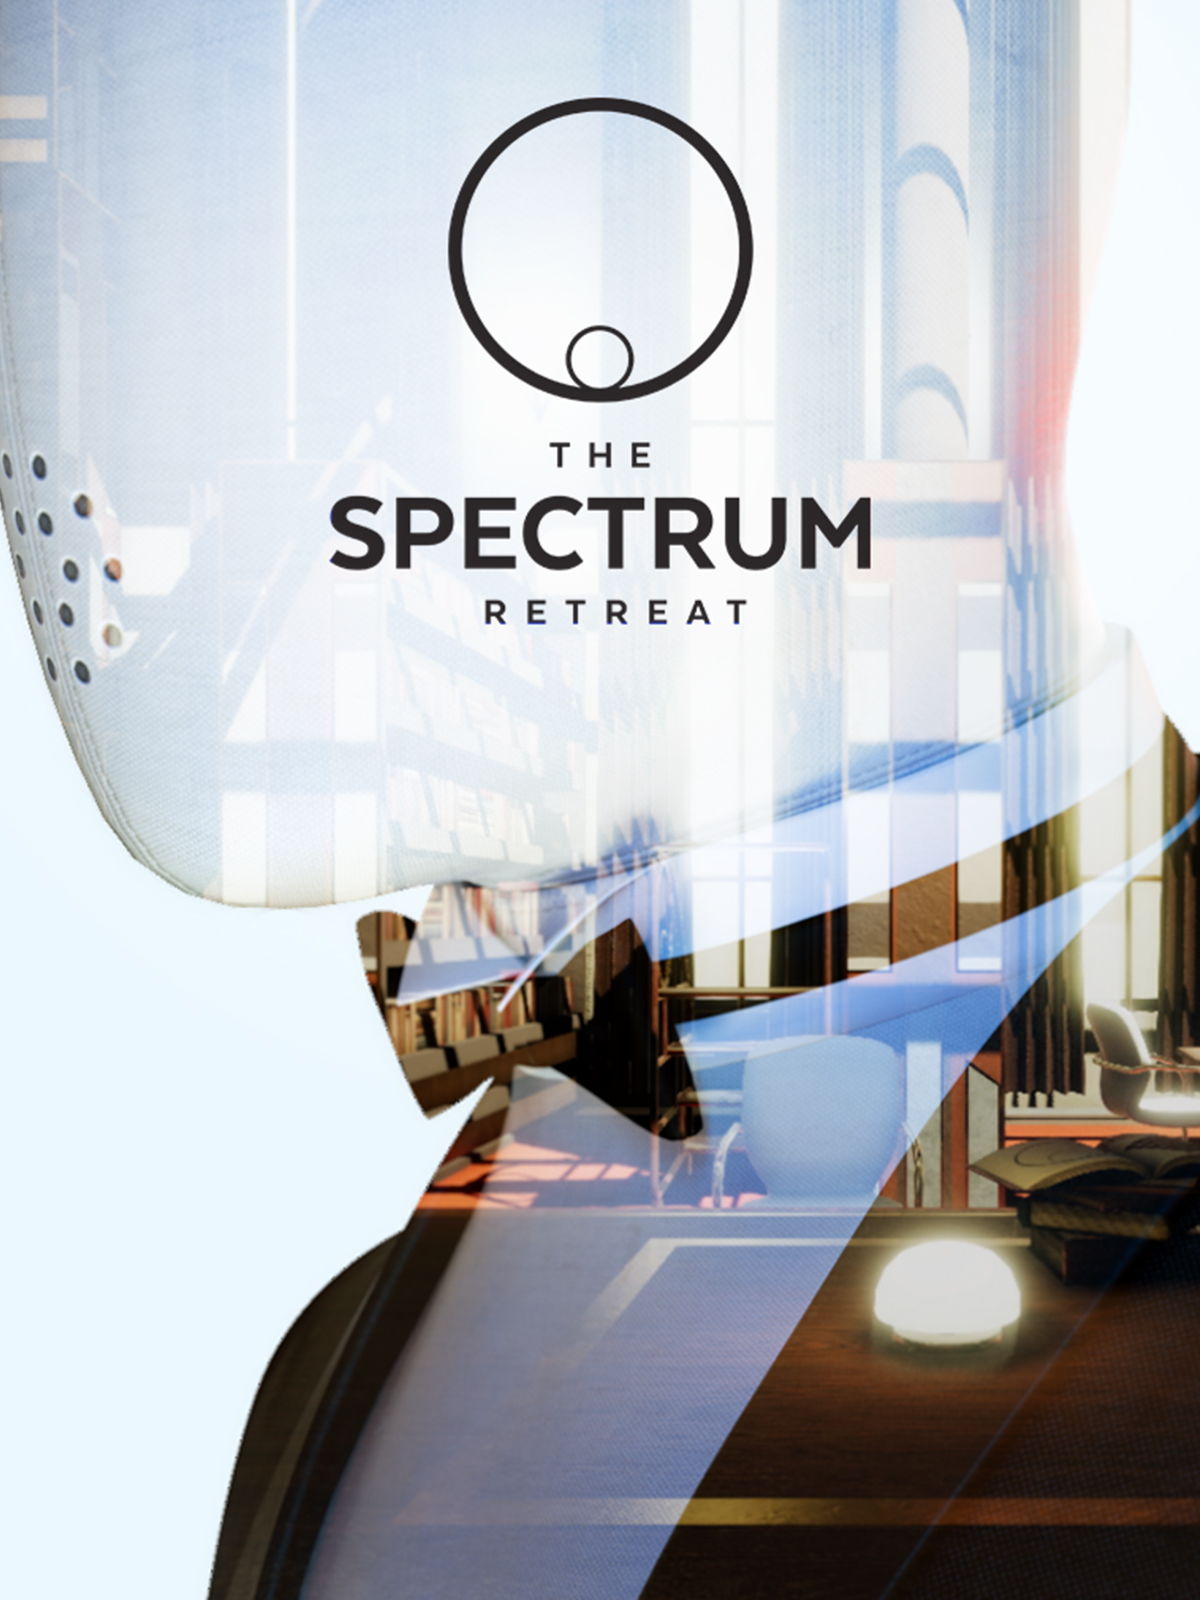 The Spectrum Retreat